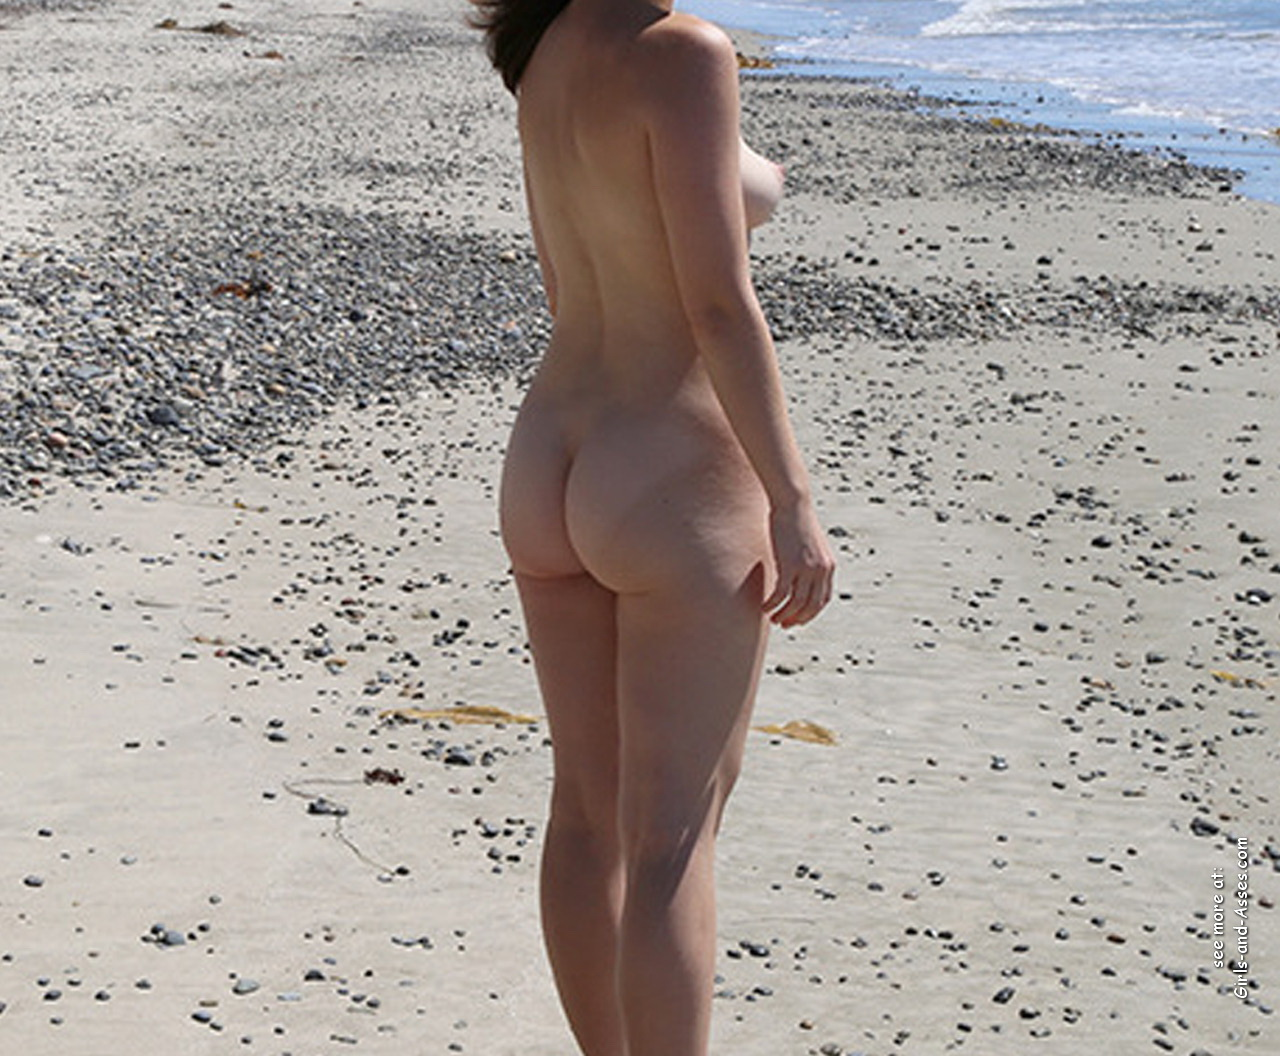 amatuer nude girl at the beach photography 03630